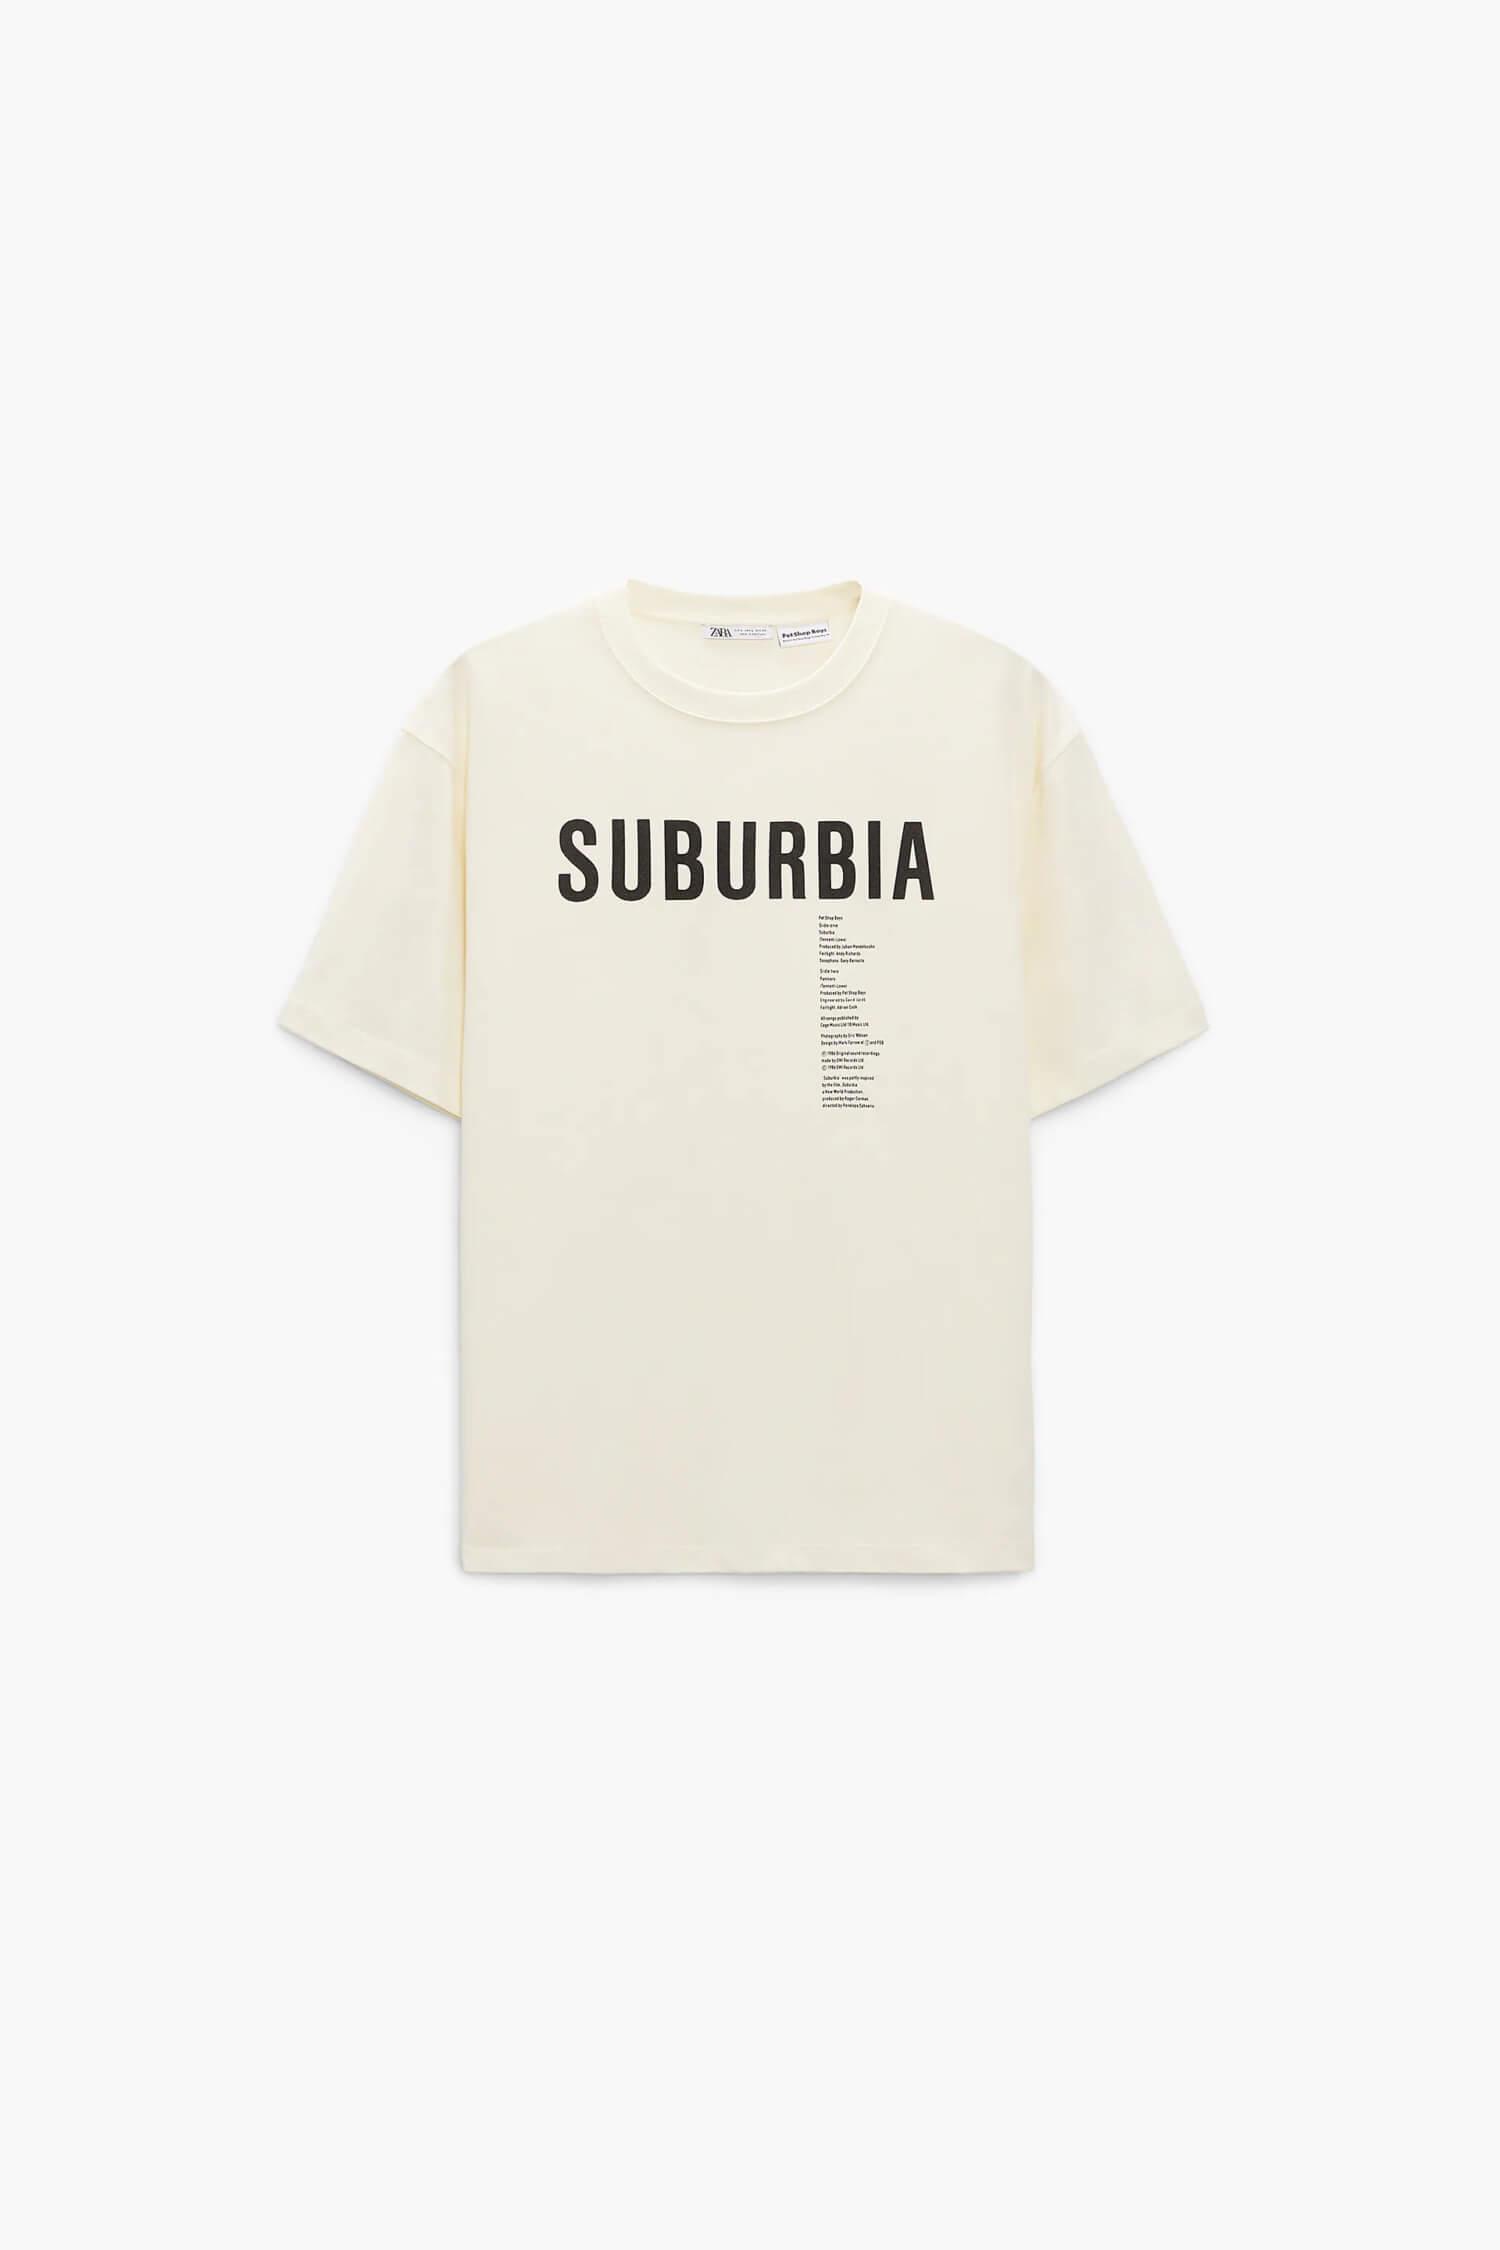 SUBURBIA © PET SHOP BOYS PARTNERSHIP プリントTシャツ